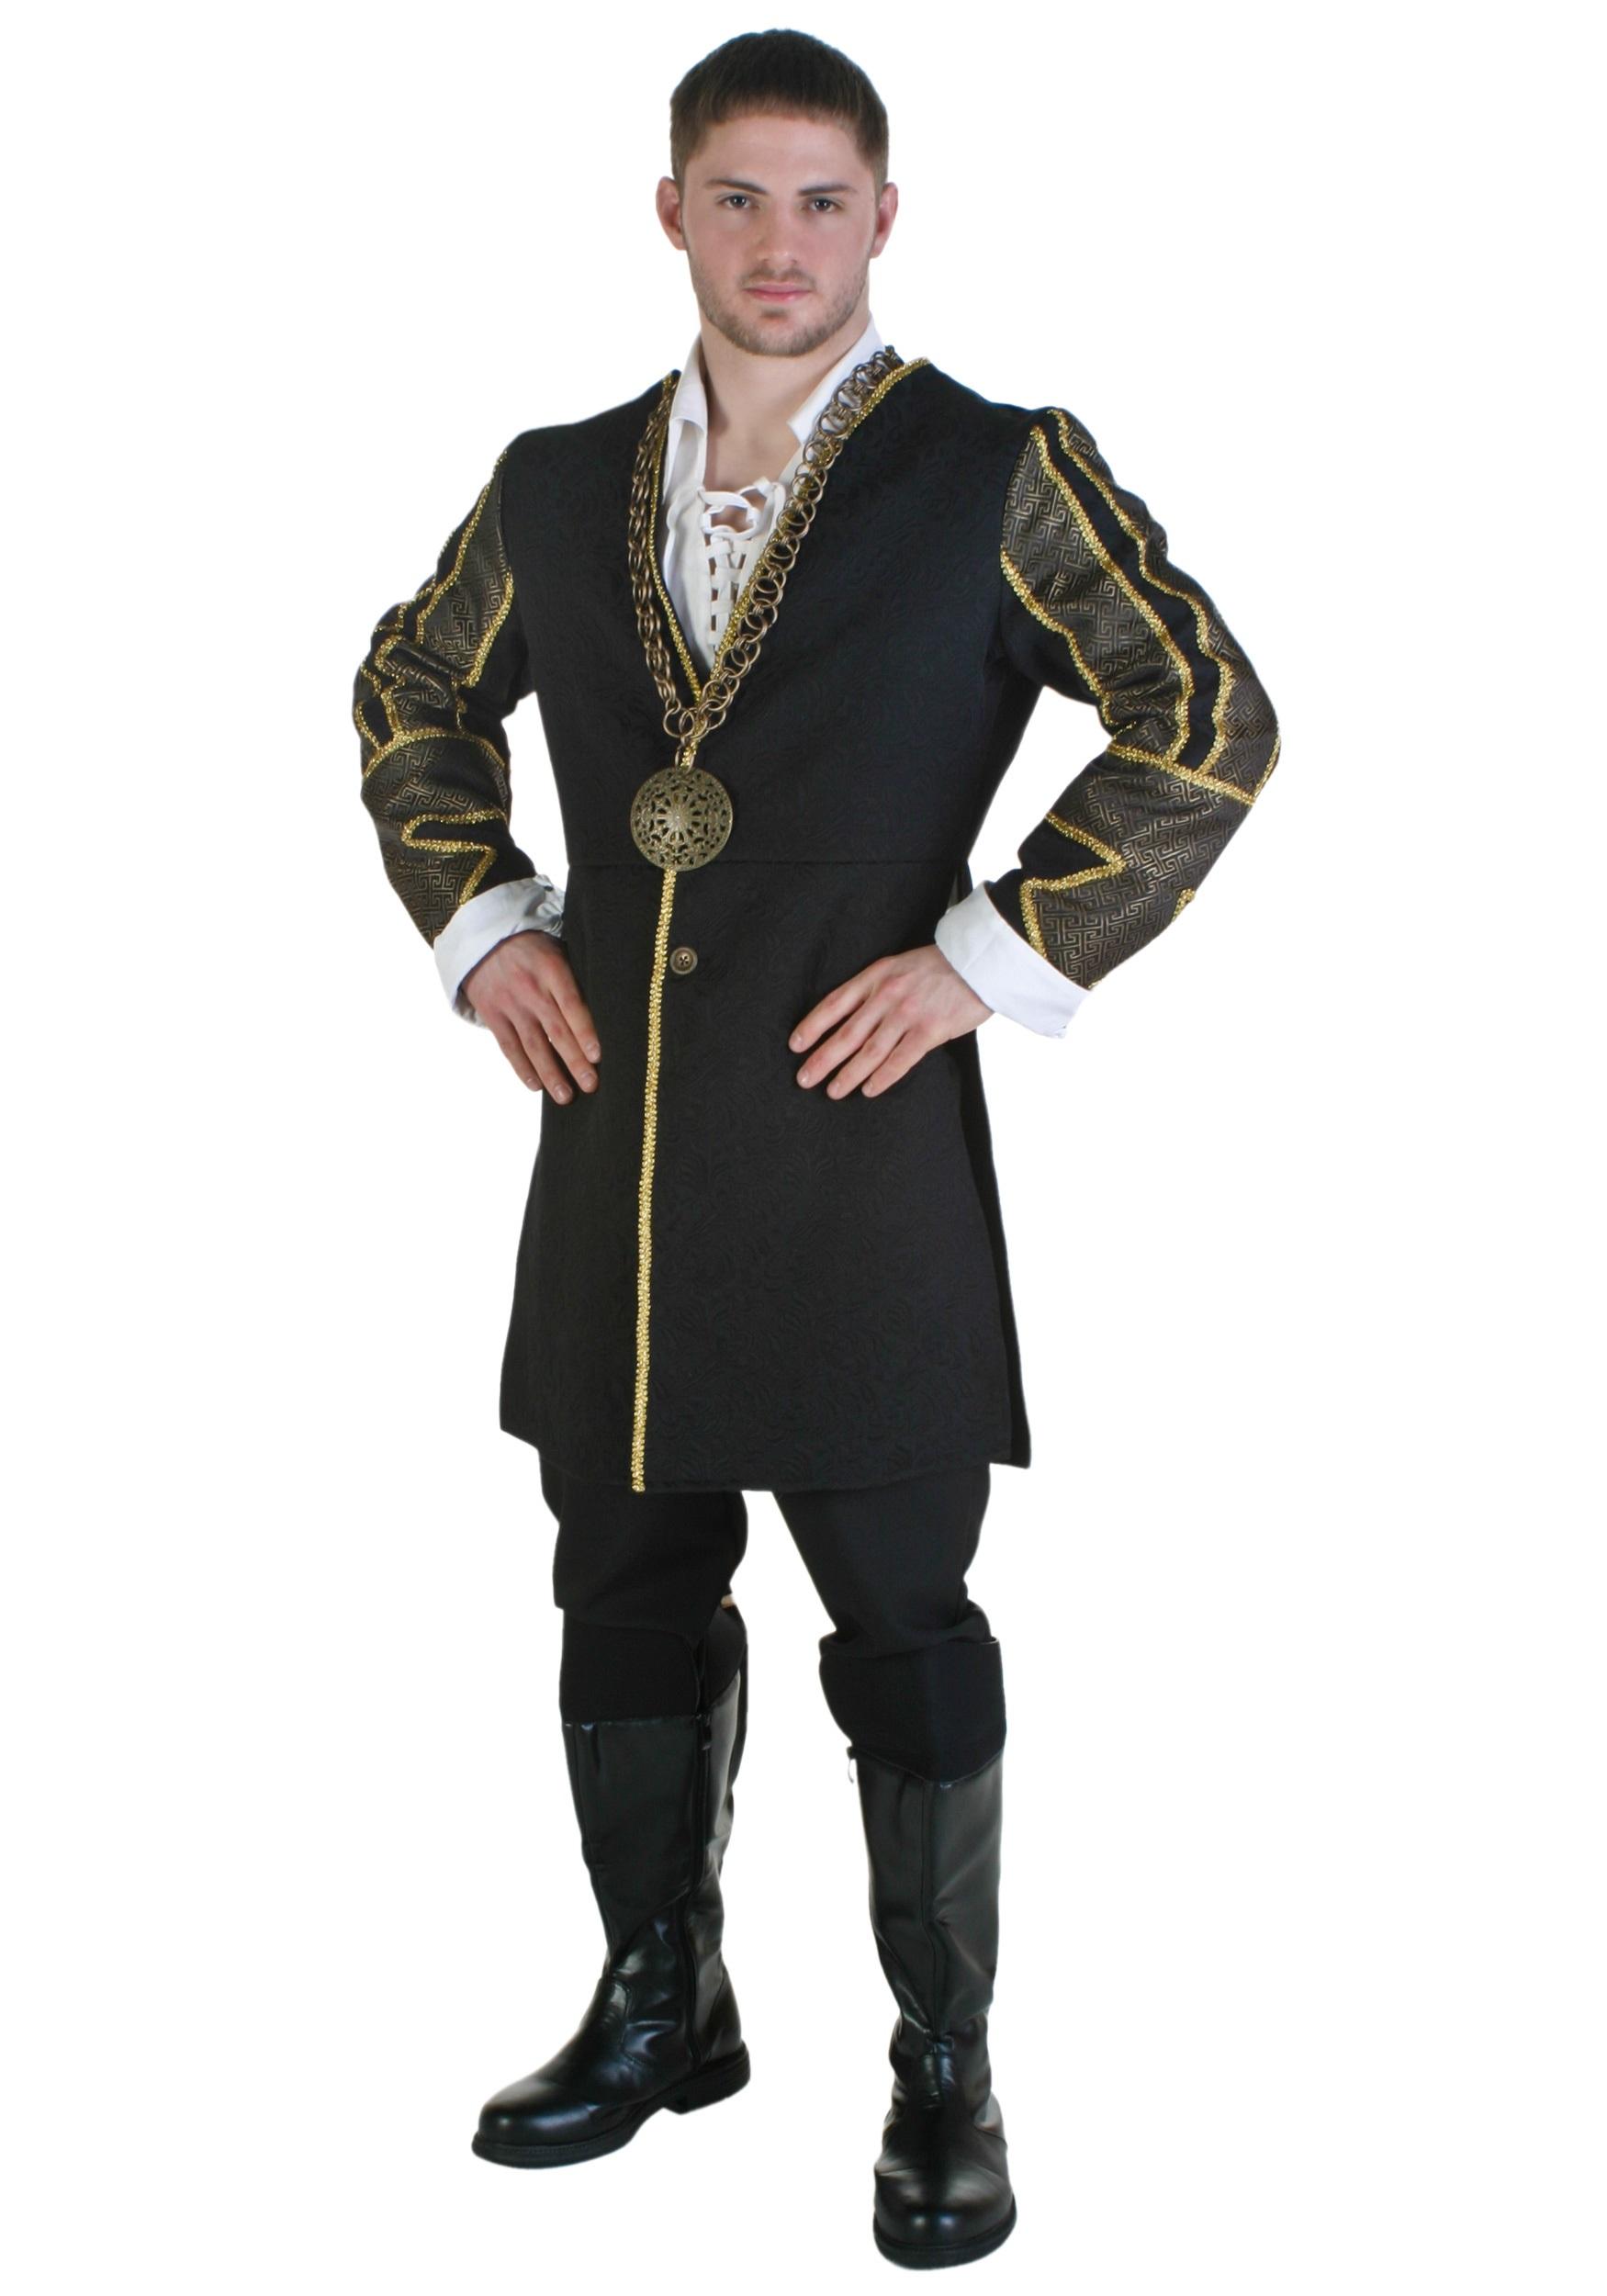 7492bea3771082 Plus Size King of England Costume - Plus Size Henry VIII Tudors Costume  Ideas